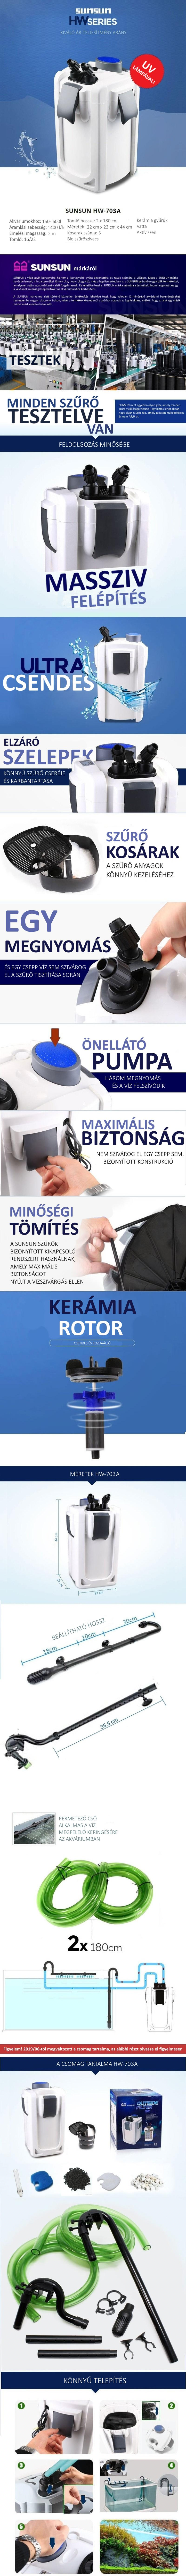 https://www.rostlinna-akvaria.cz/vupload/826105664.png